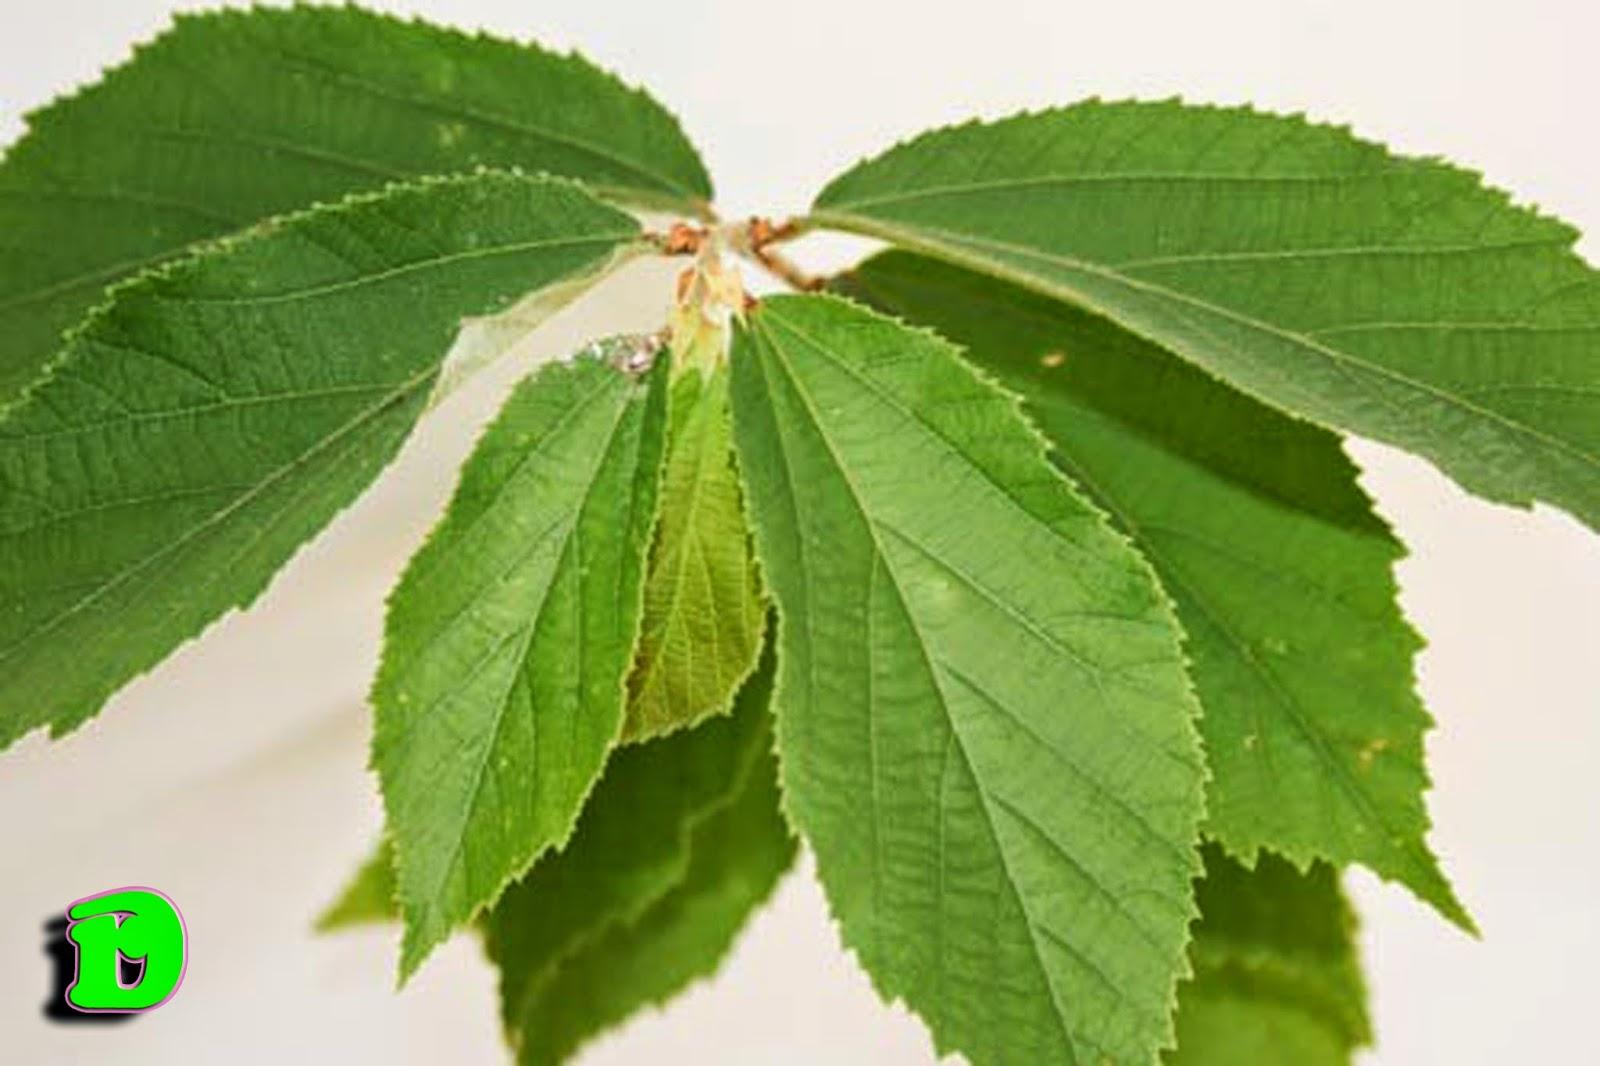 PLANTAS MEDICINAIS: AÇOITA CAVALO (Luehea grandiflora) #08C902 1600x1066